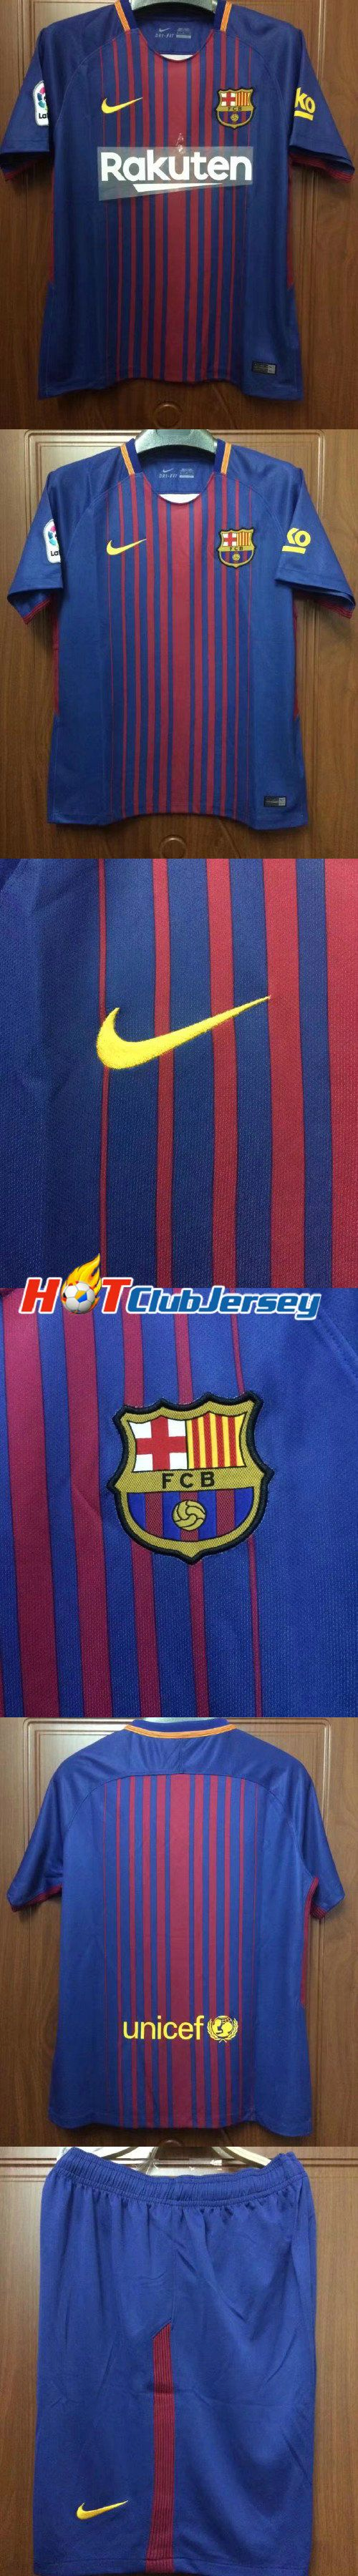 Buy Now only $18 Barcelona  SUAREZ Jerseys 2017 2018 Camisas Neymar Messi INIESTA PIQUE Soccer Jersey 17 18 Camiseta de futbol size:S-4XL http://hotclubjersey.x.yupoo.com/albums/2720530?uid=1&referrercate=120755